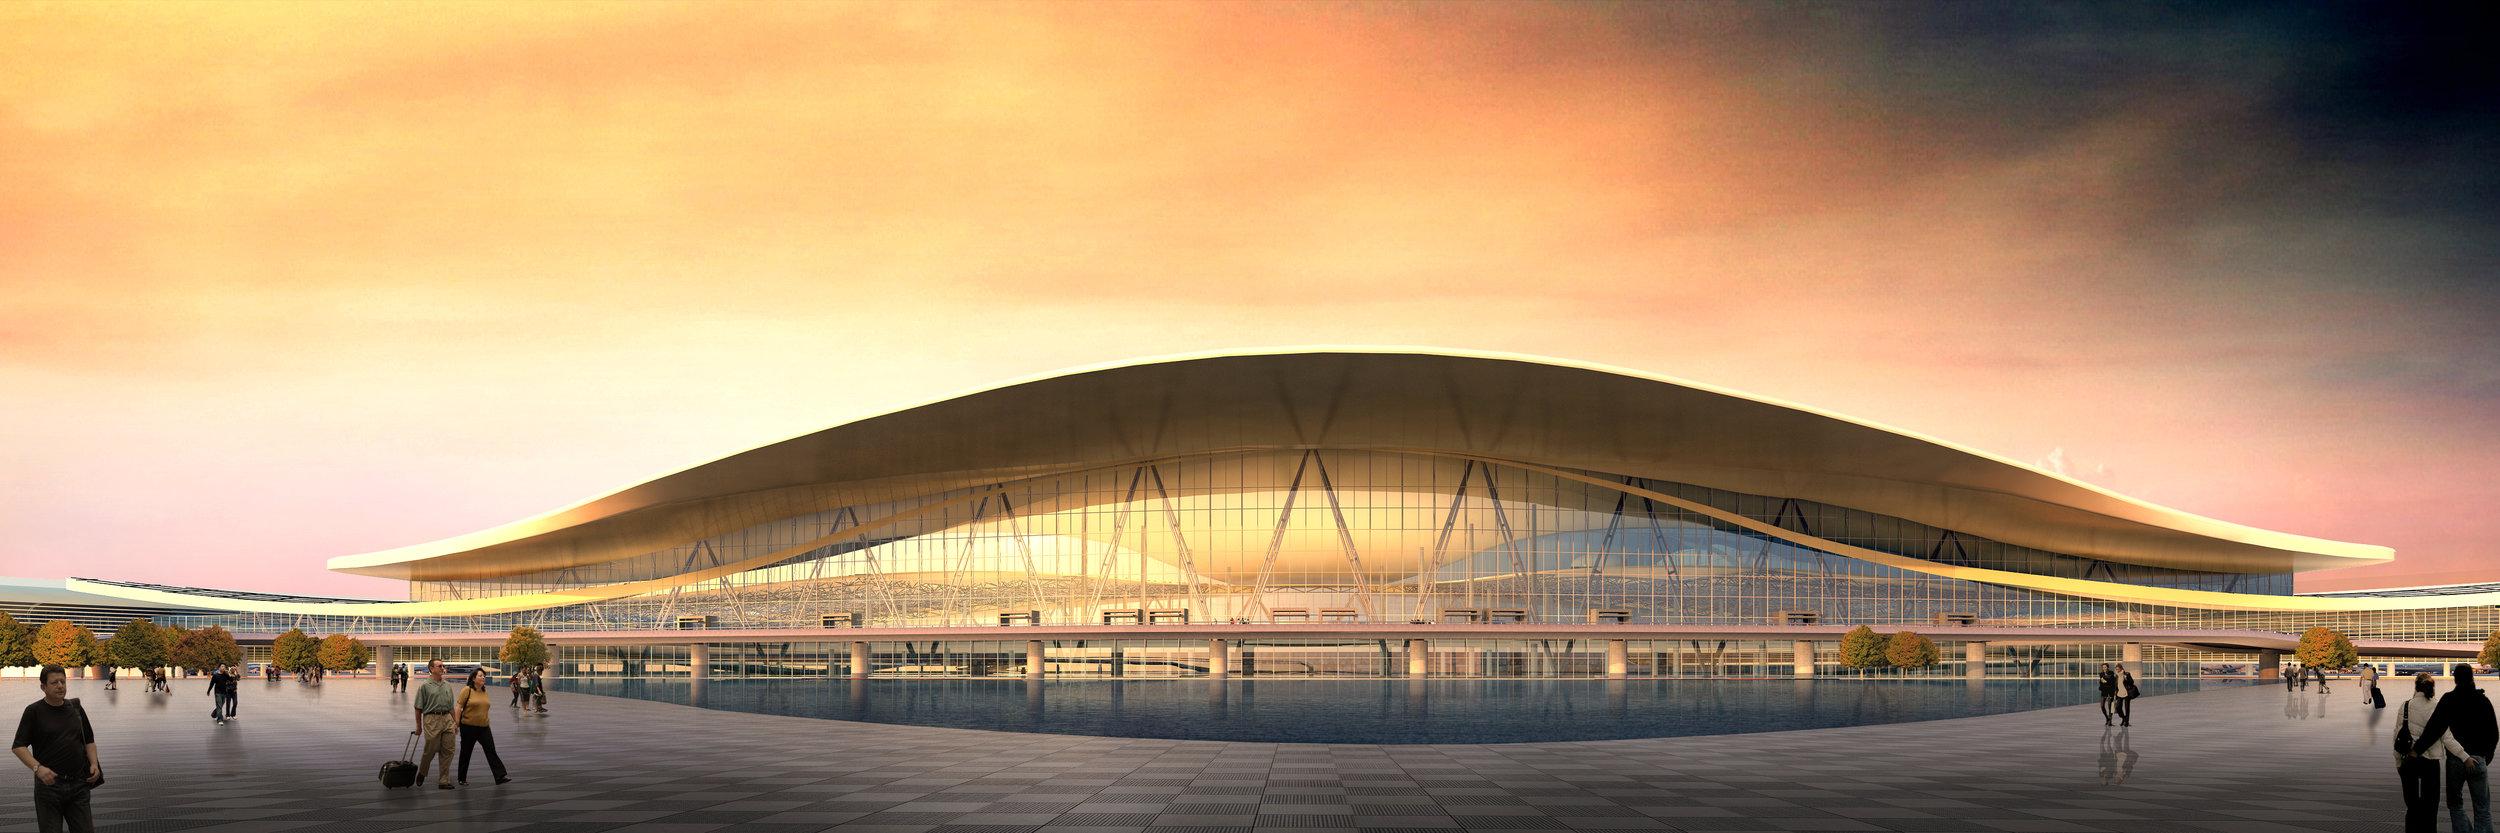 Tianhe Int'l Airport<br>天河國際機場